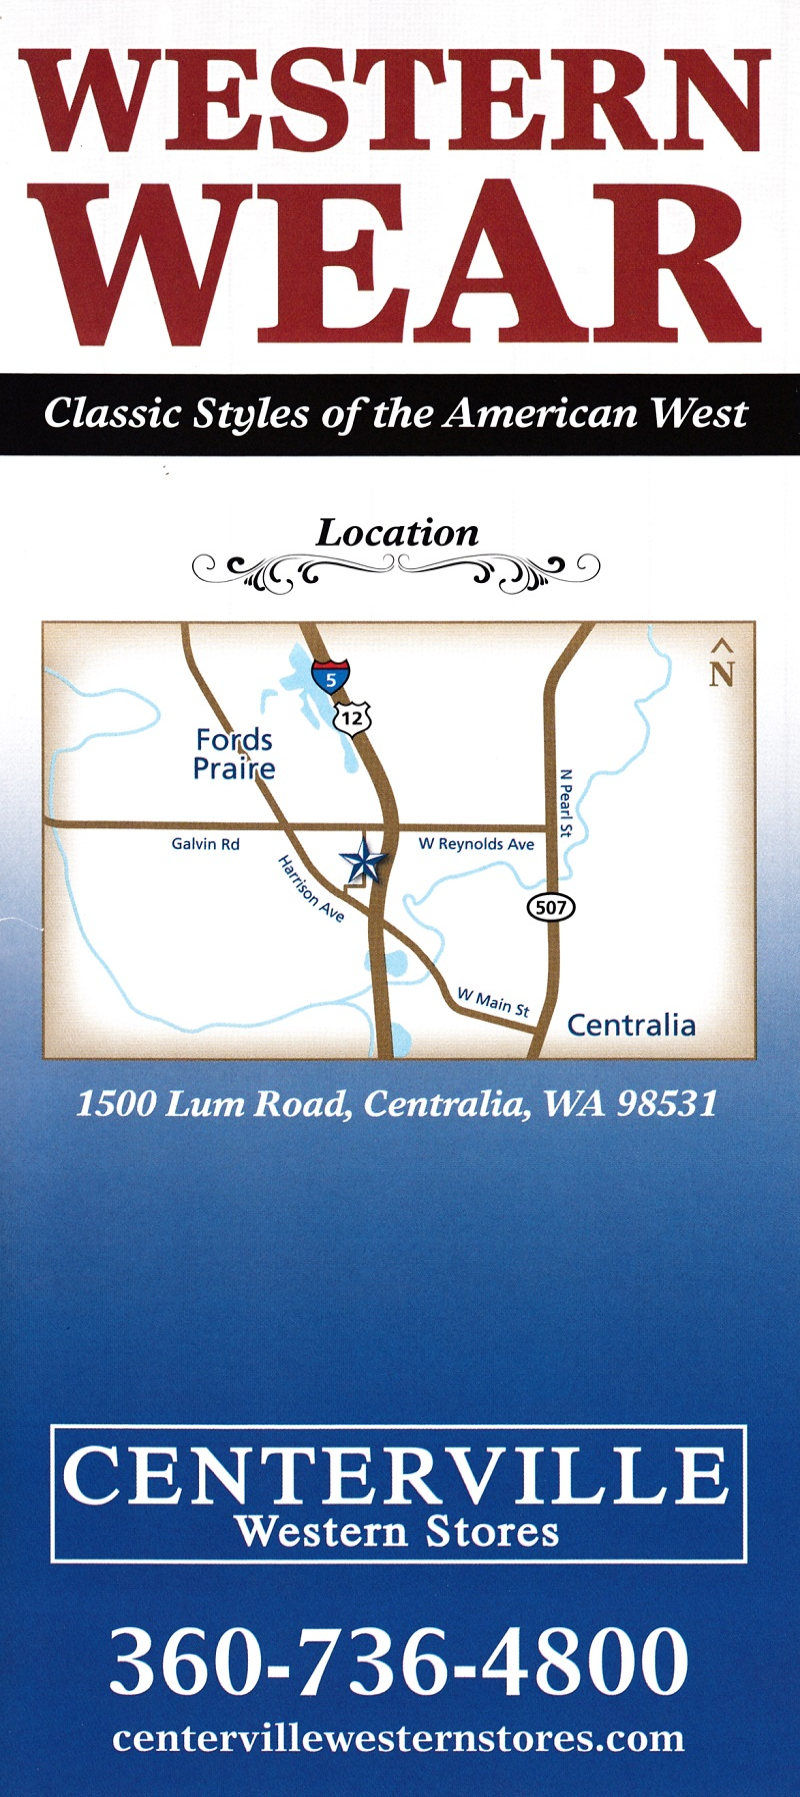 Centerville Western Stores brochure thumbnail